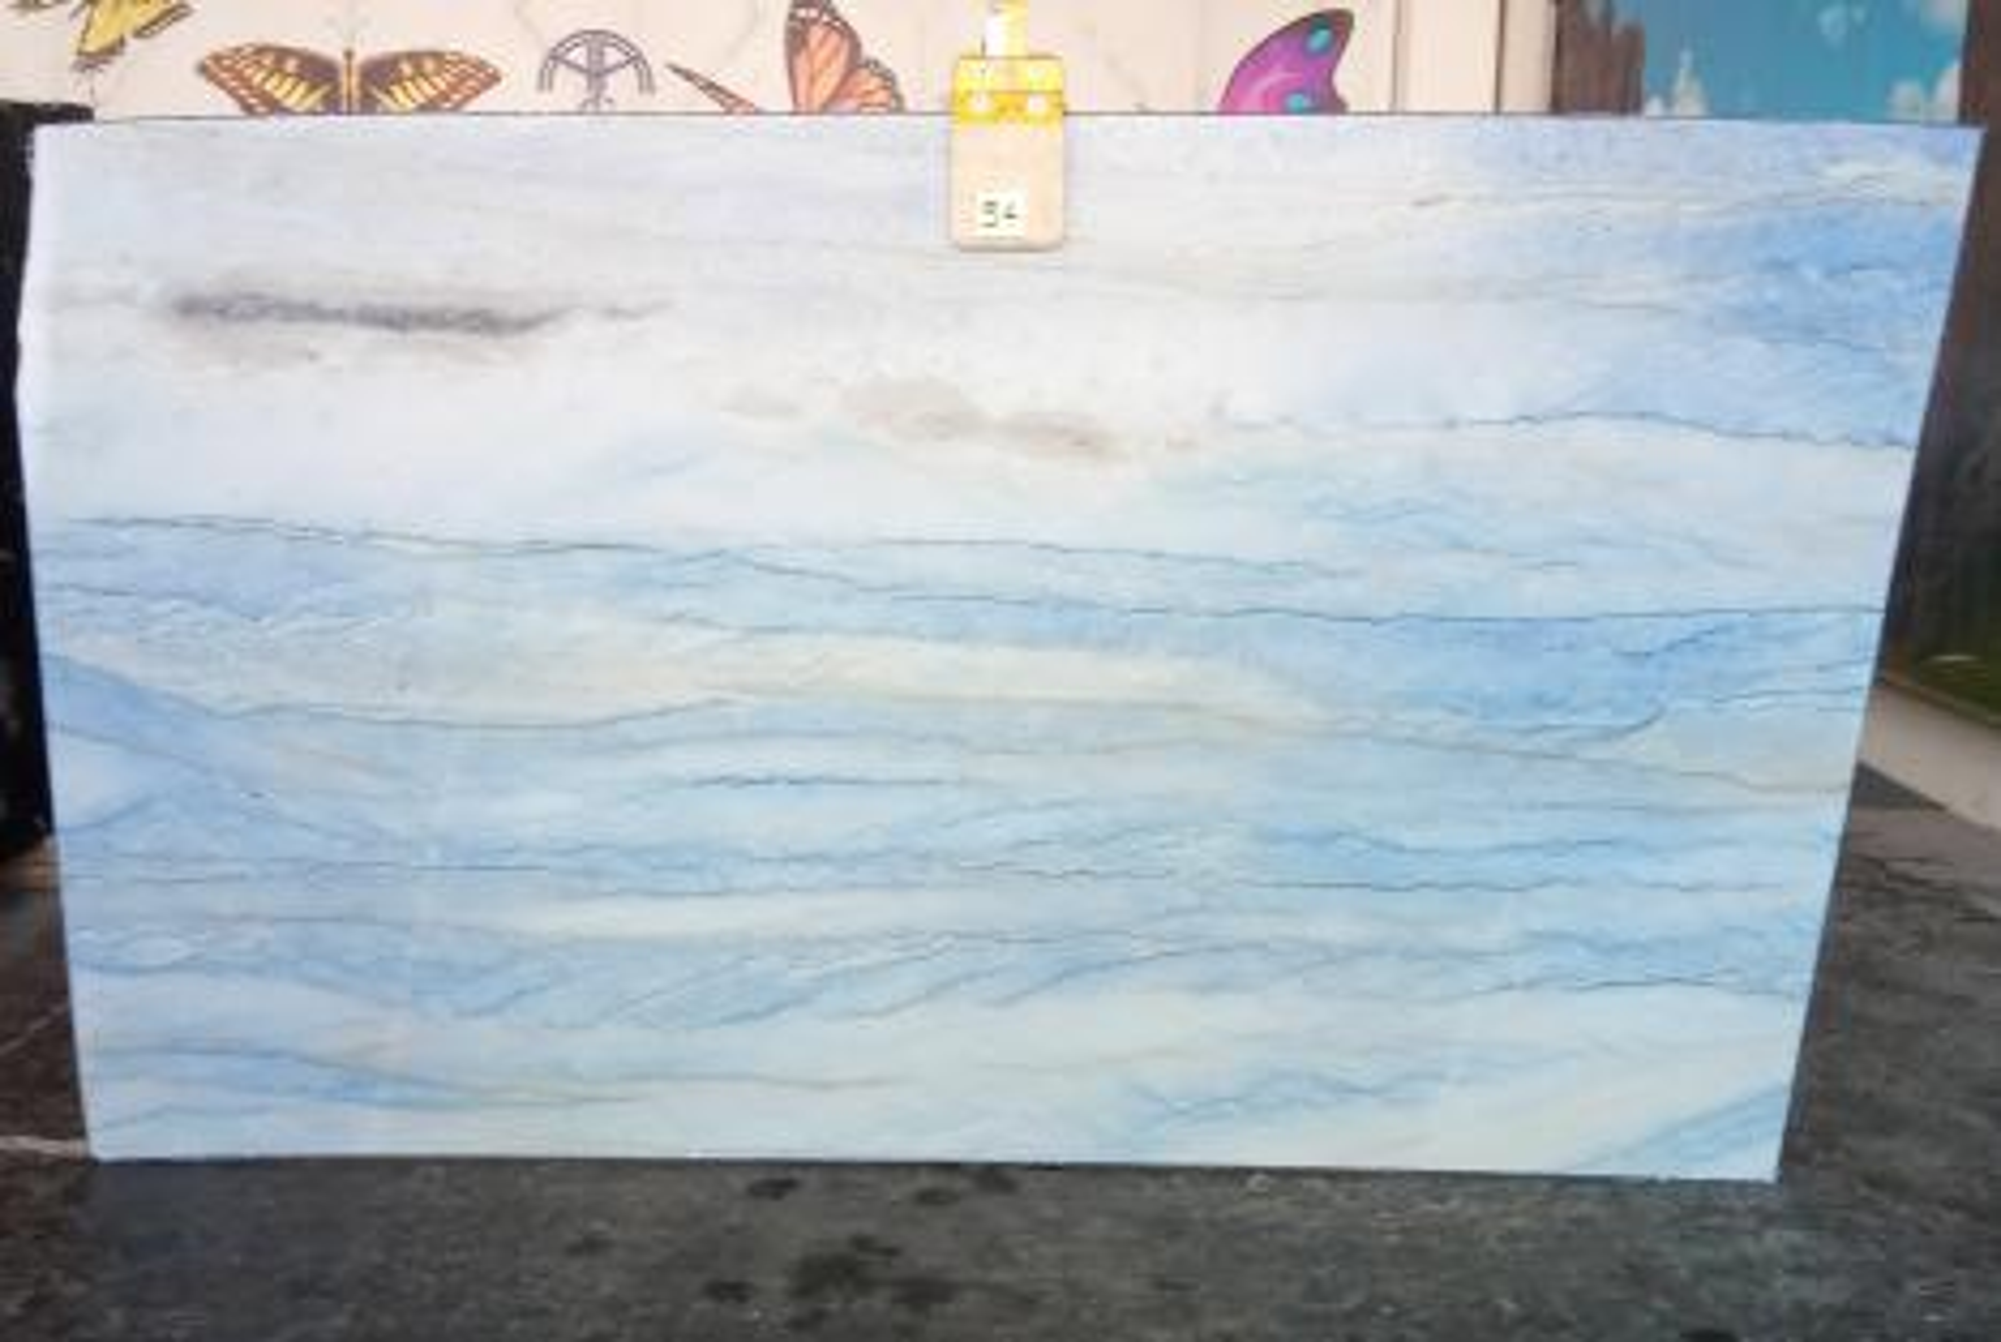 AZUL MAKAUBA Fornitura Veneto (Italia) di lastre grezze lucide in marmo naturale Z0191 , Slab #54